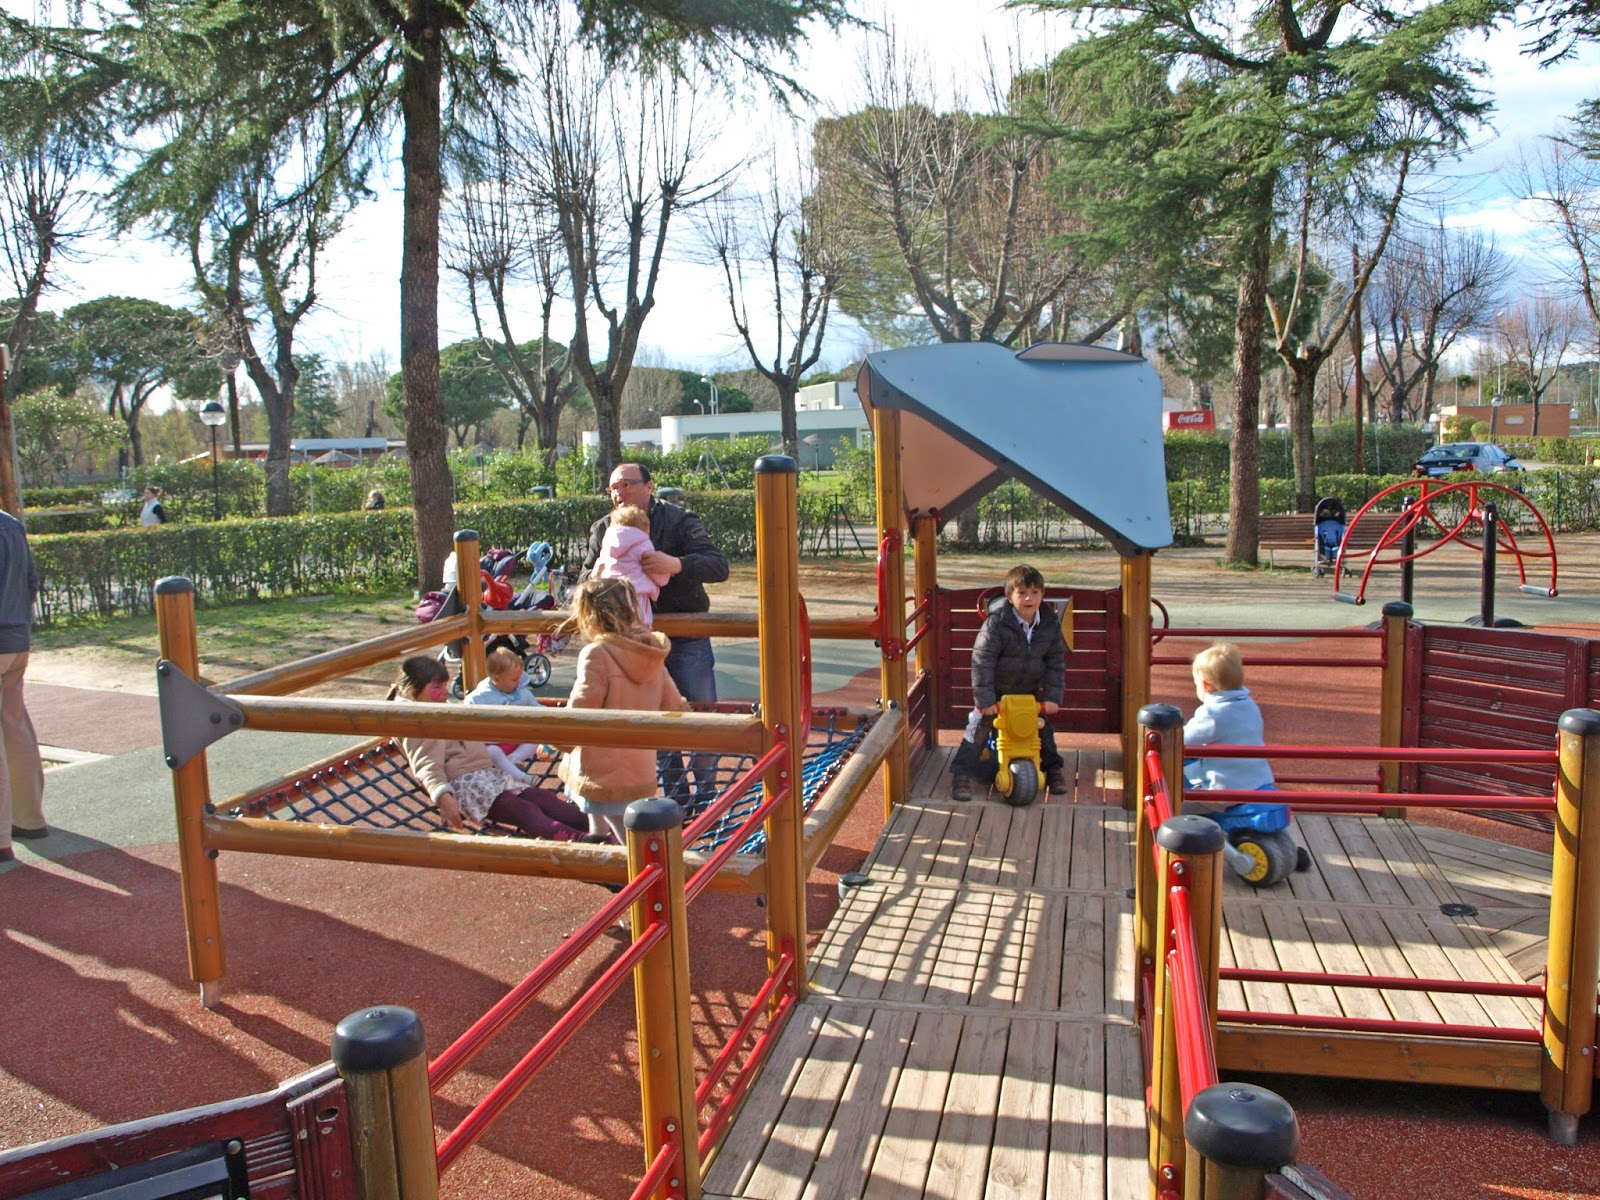 quien ha investigado sobre parques infantiles accesibles